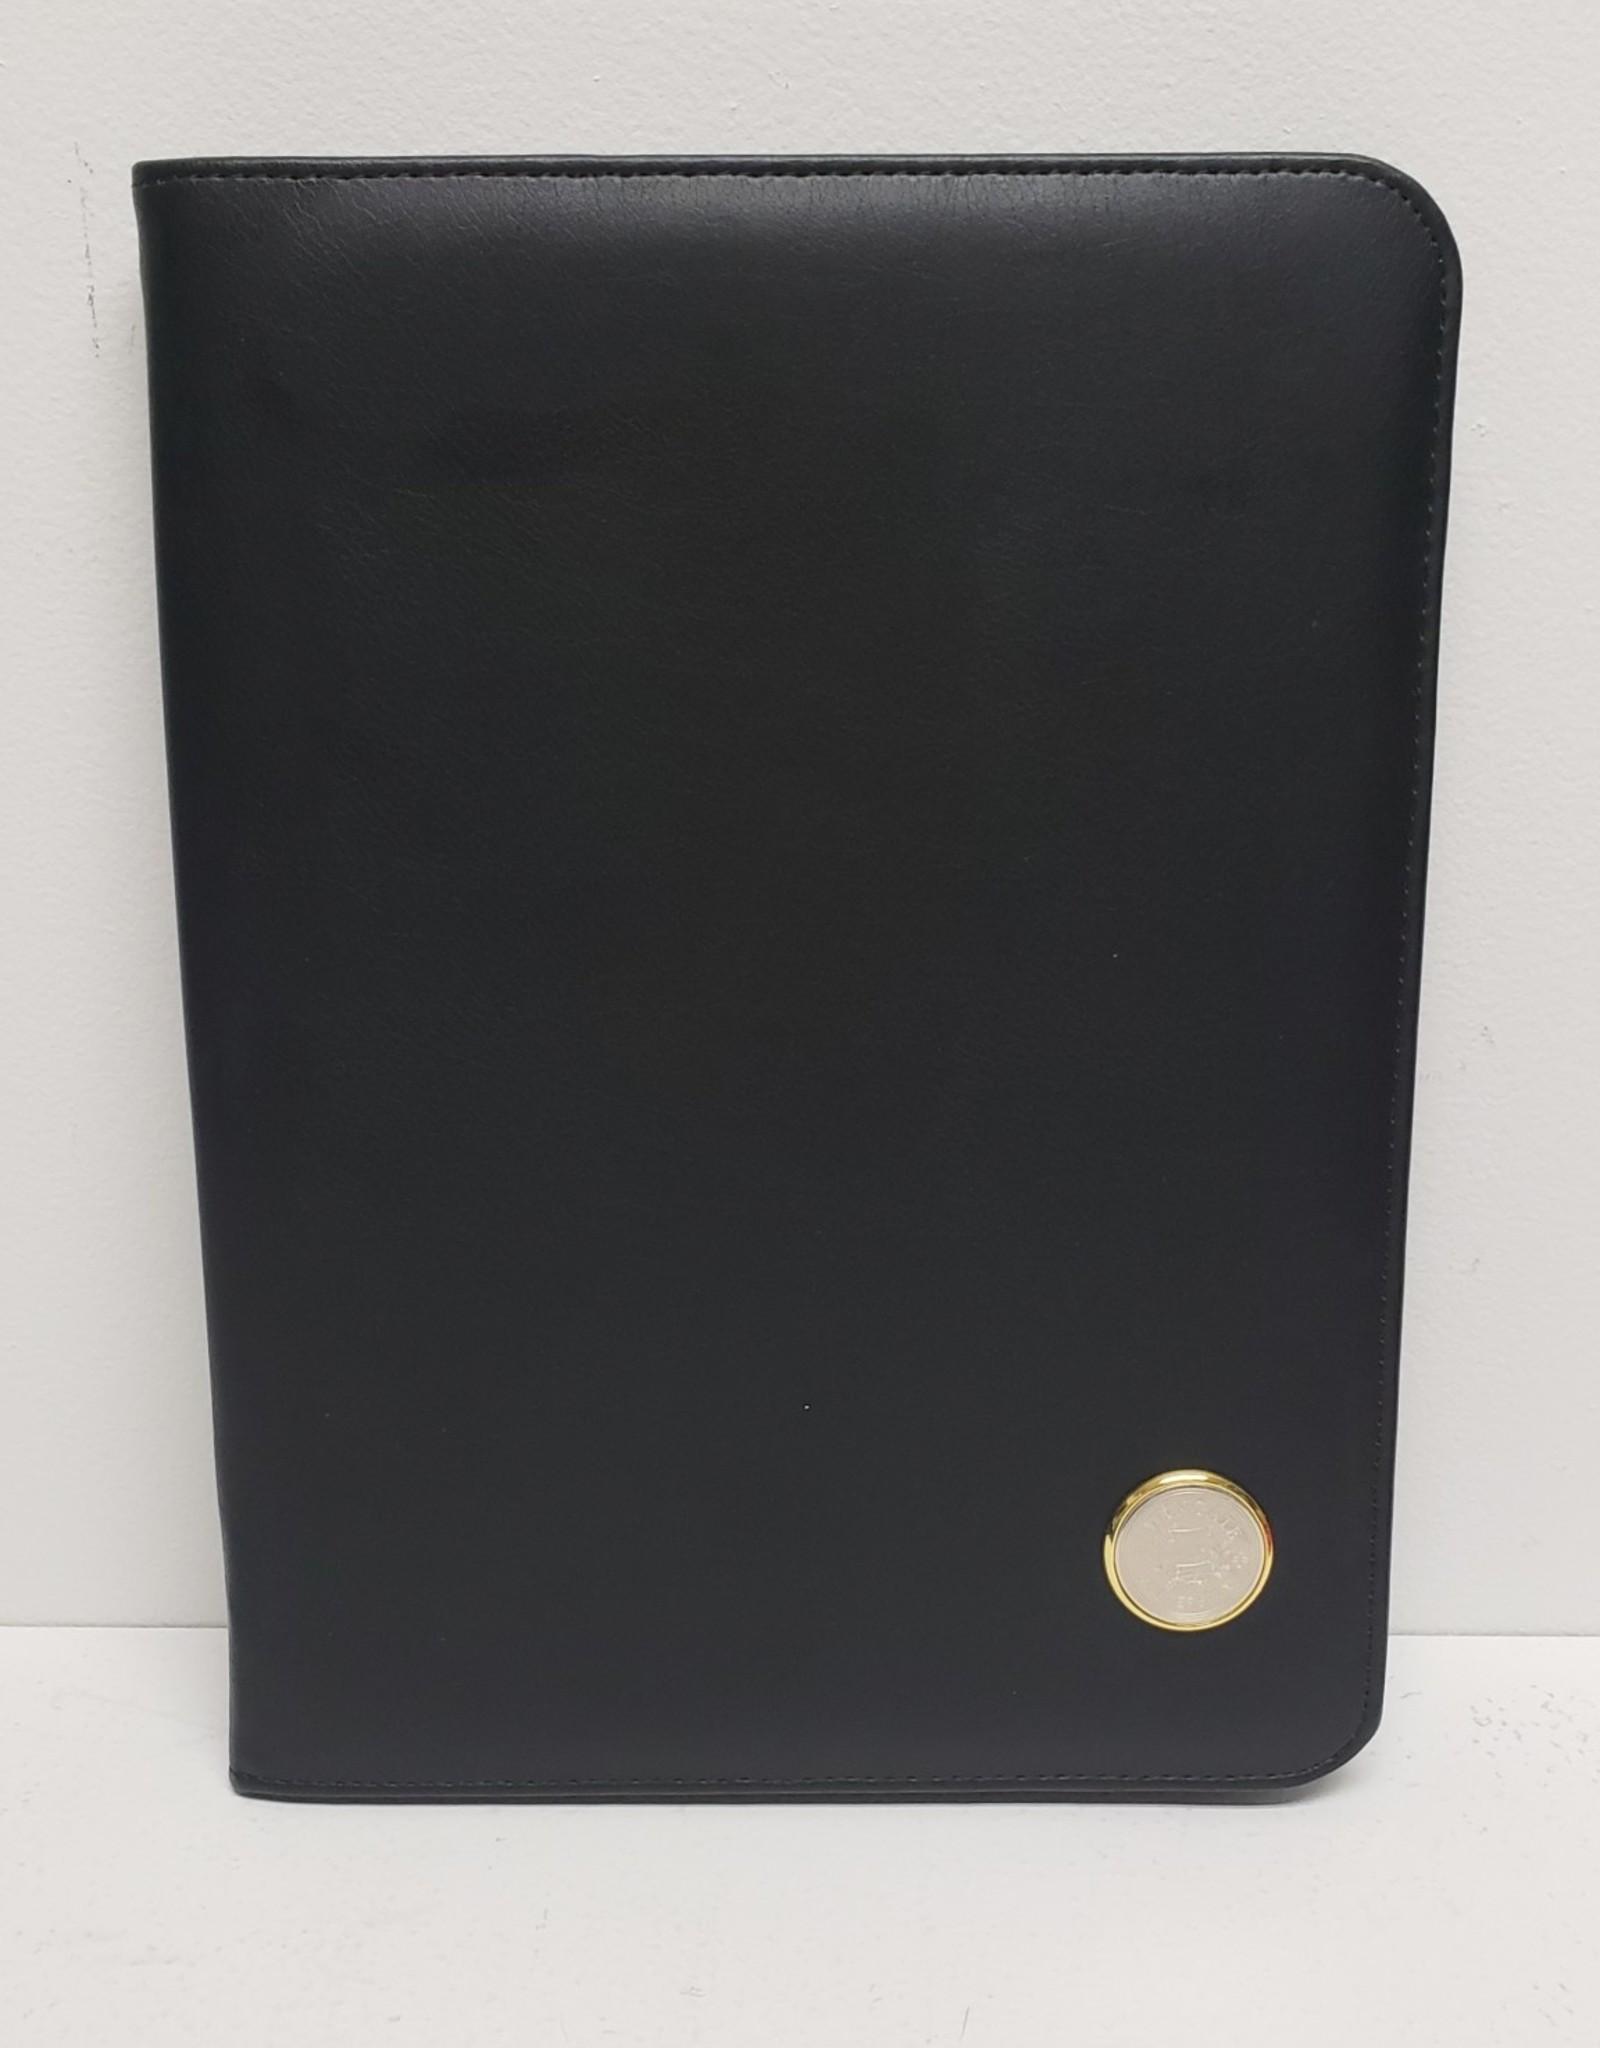 Black Zipper Padfolio New Gold Seal